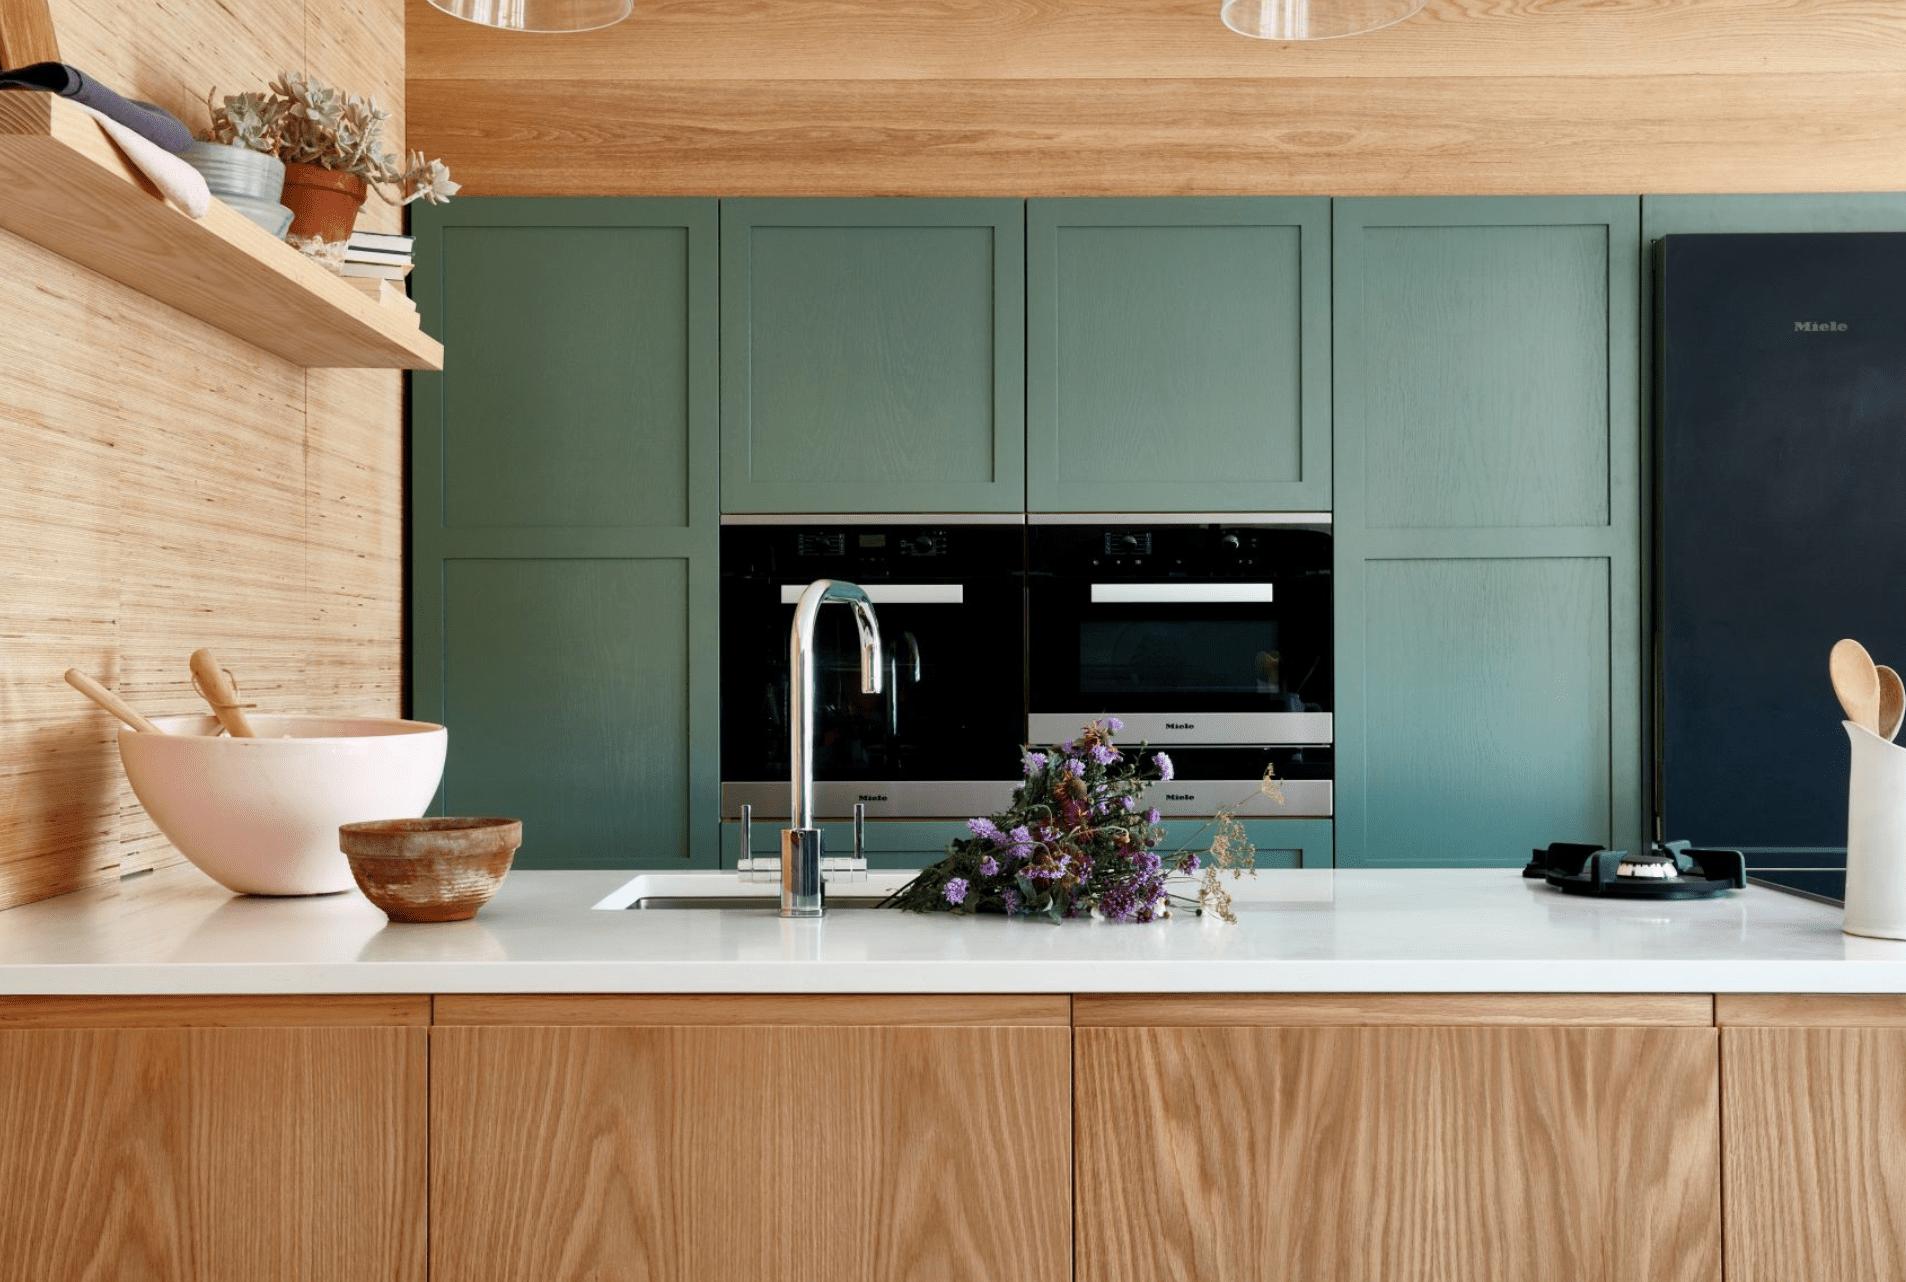 Green kitchen with quartz countertops